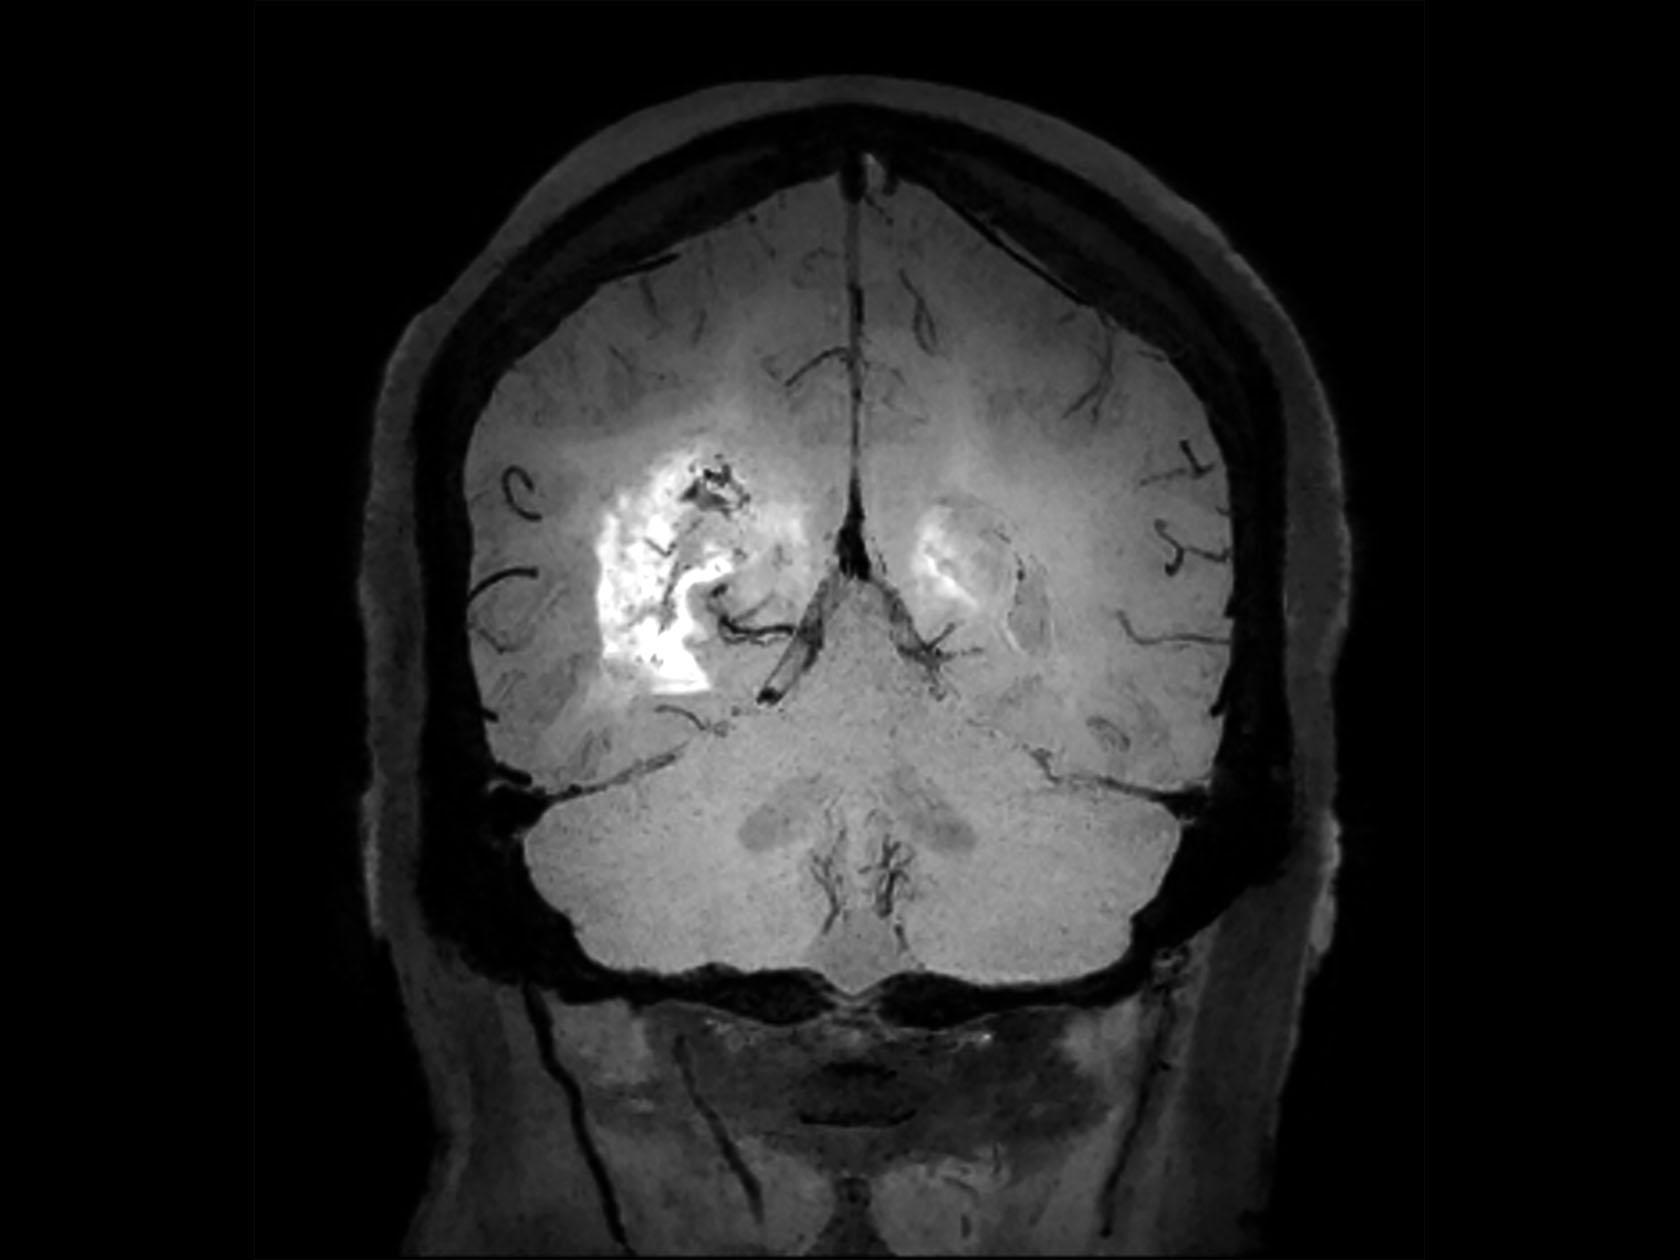 Coronal 3D BrainVIEW Black Blood